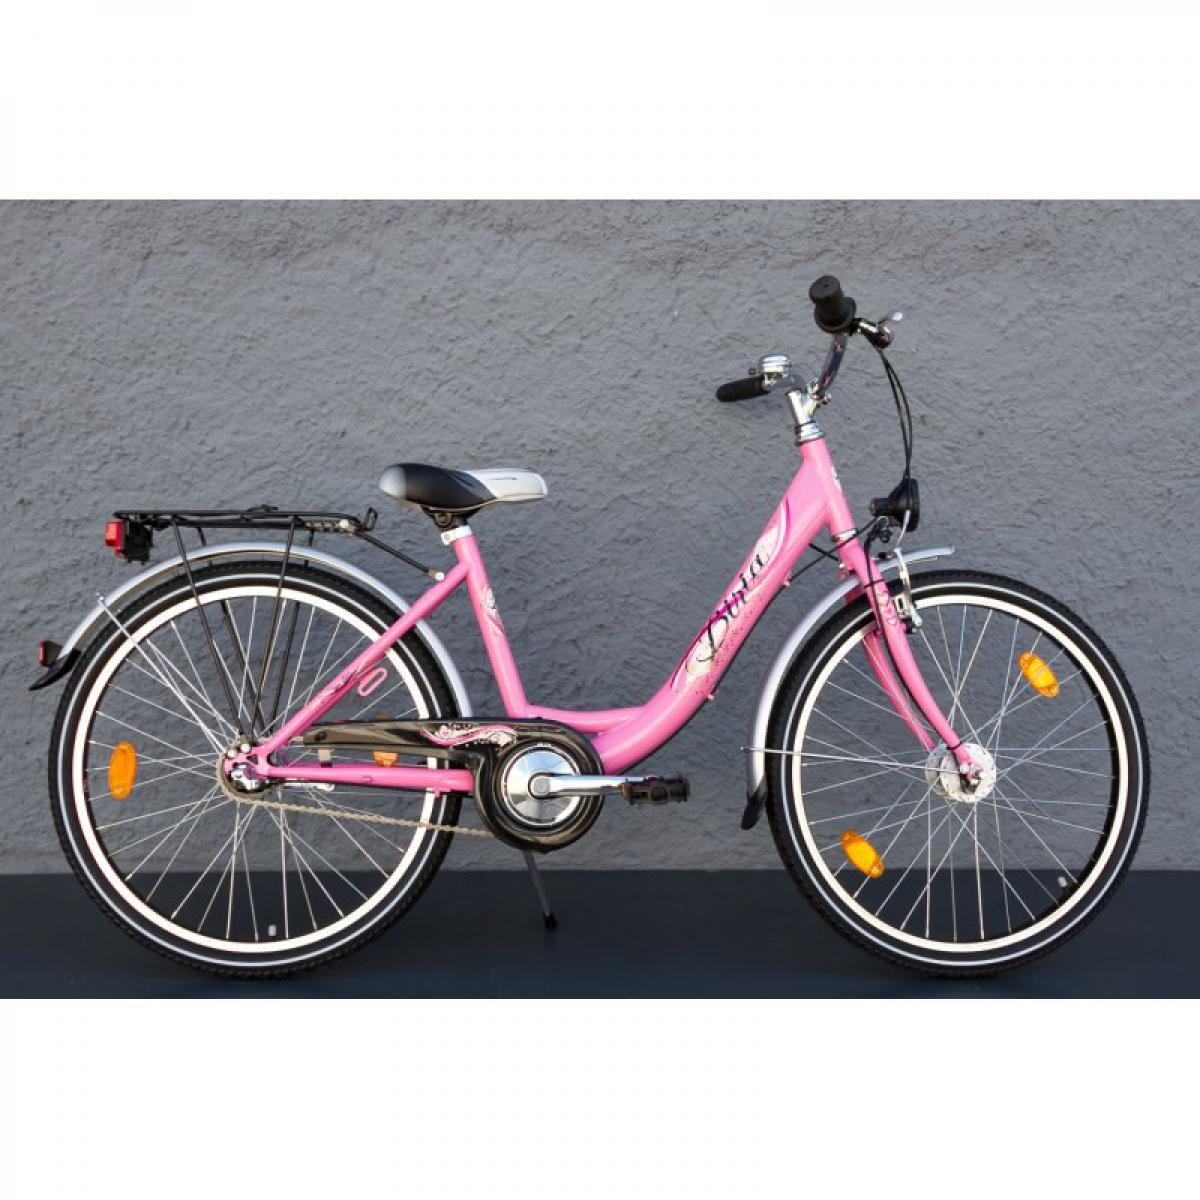 "24"" Zoll MIFA Biria Kinder- Mädchen Fahrrad Shimano 3 Gang"